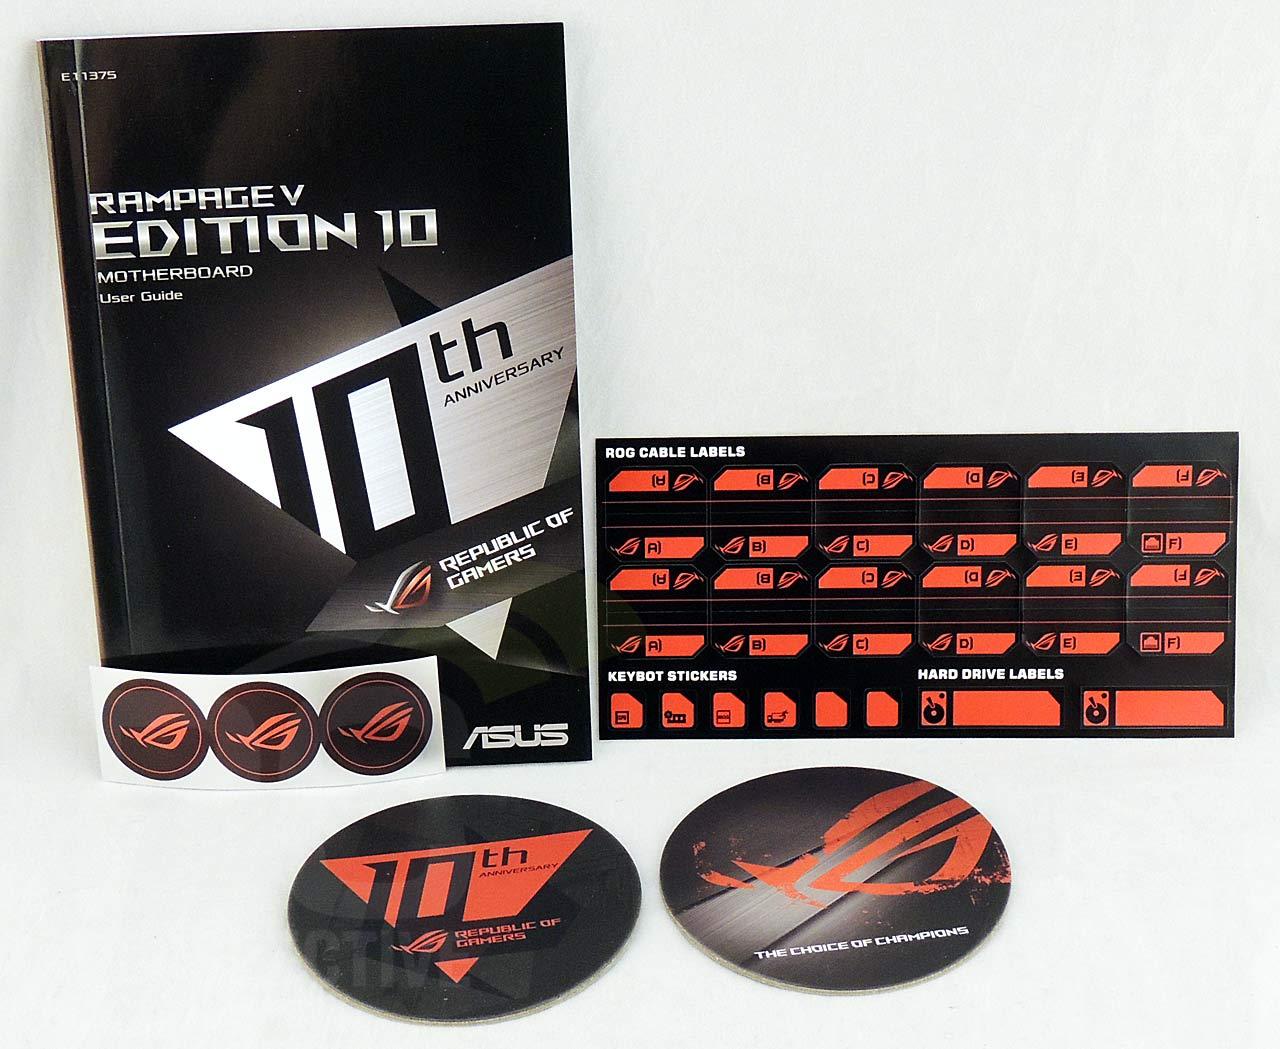 13-manual-stickers.jpg